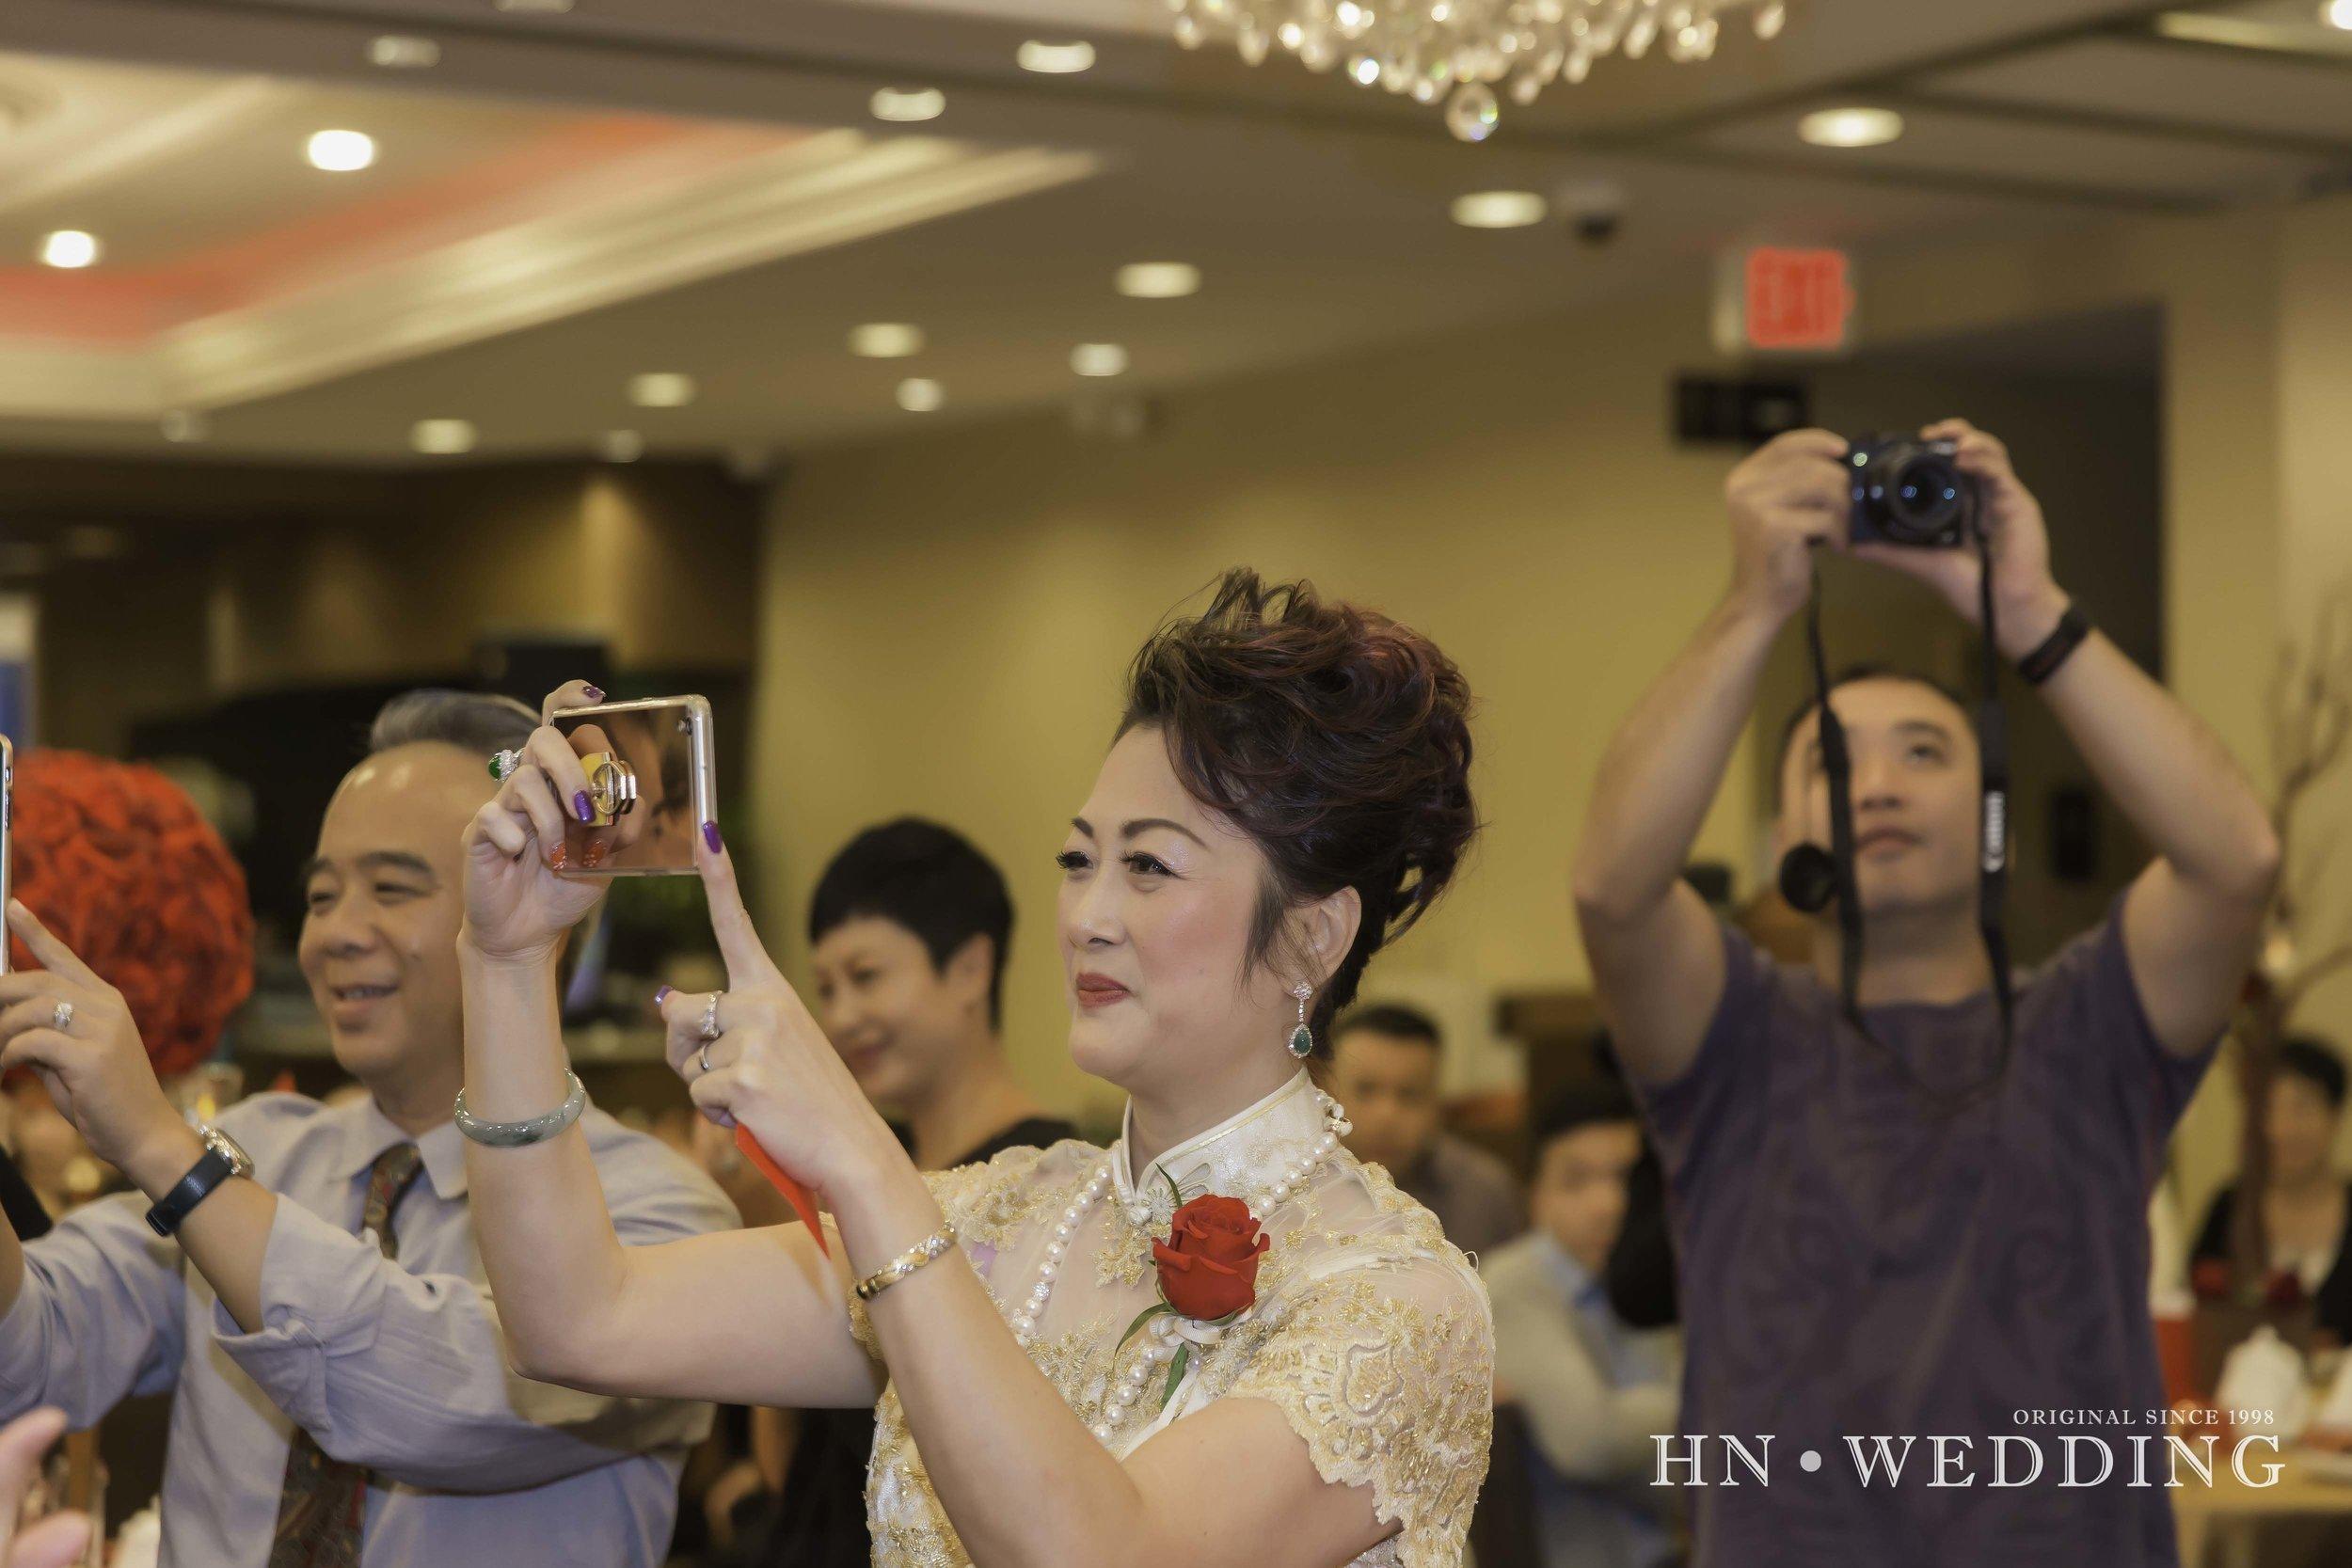 HNwedding-20160815-wedding-040.jpg